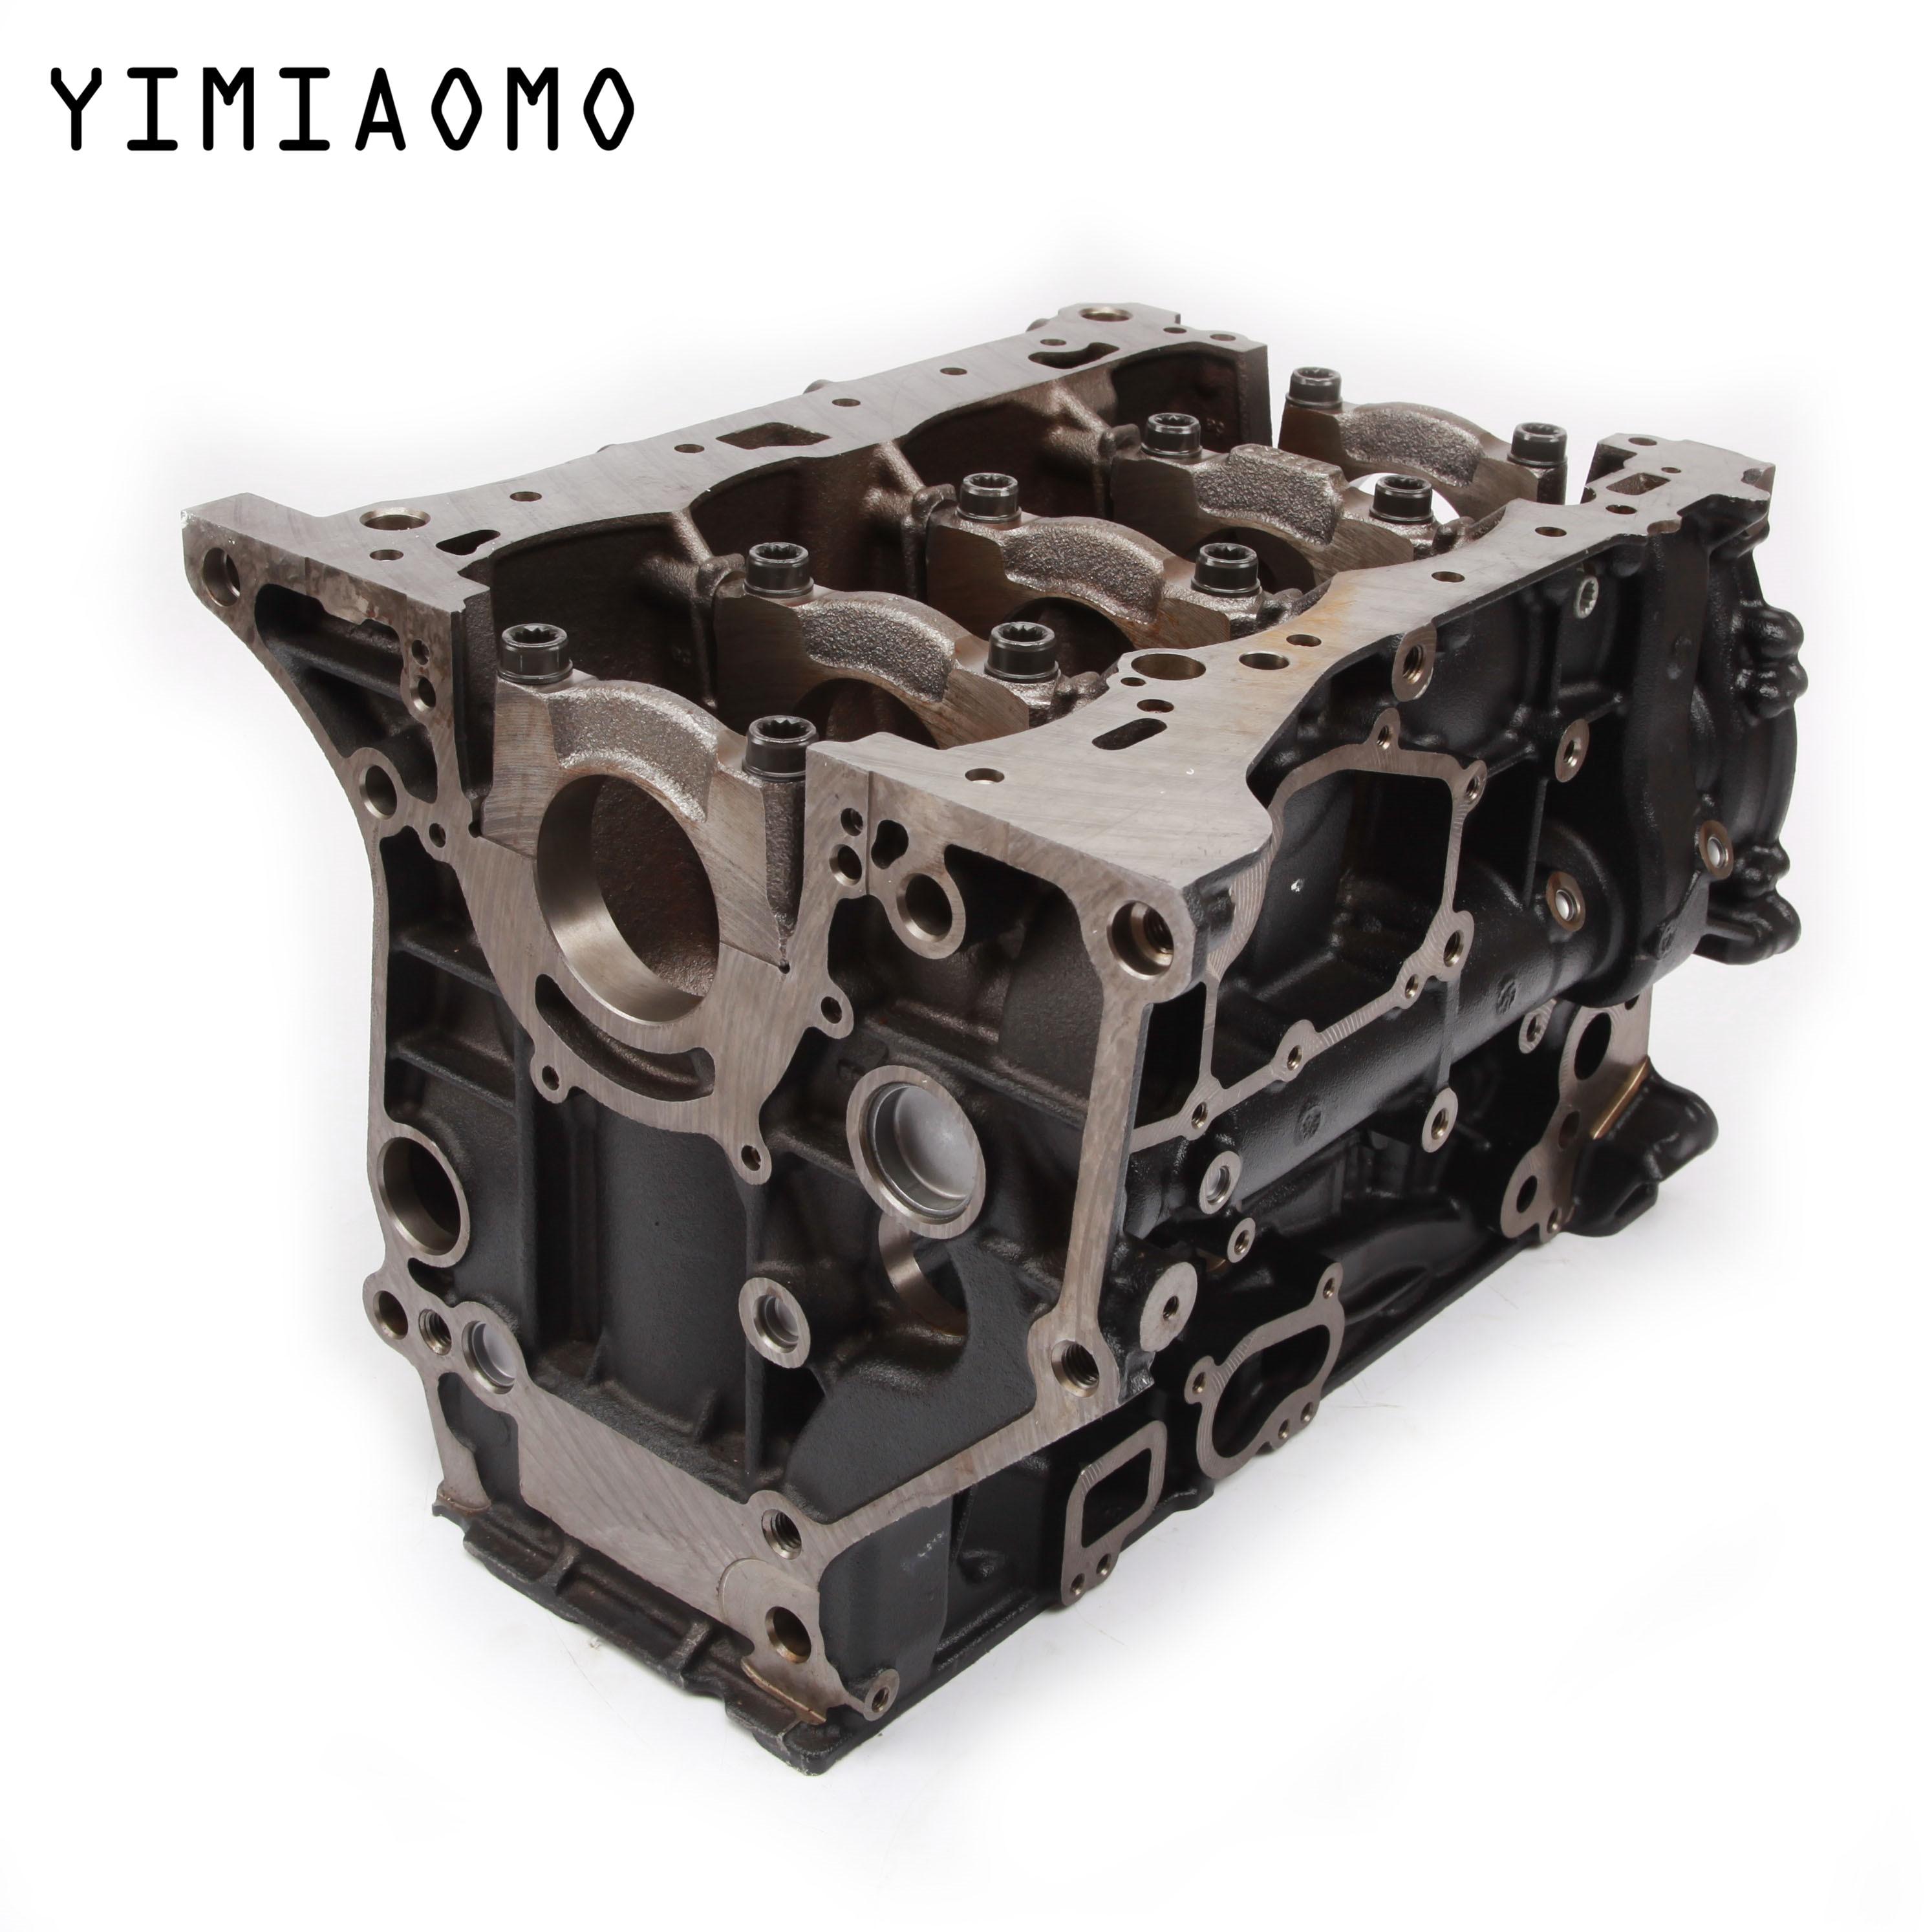 06 h 103 011 br caixa de manivela do motor bloco cilindro para audi a3 a4 a5 q3/5 tt vw cc passat jetta tiguan skoda assento 06 h 103 011 k